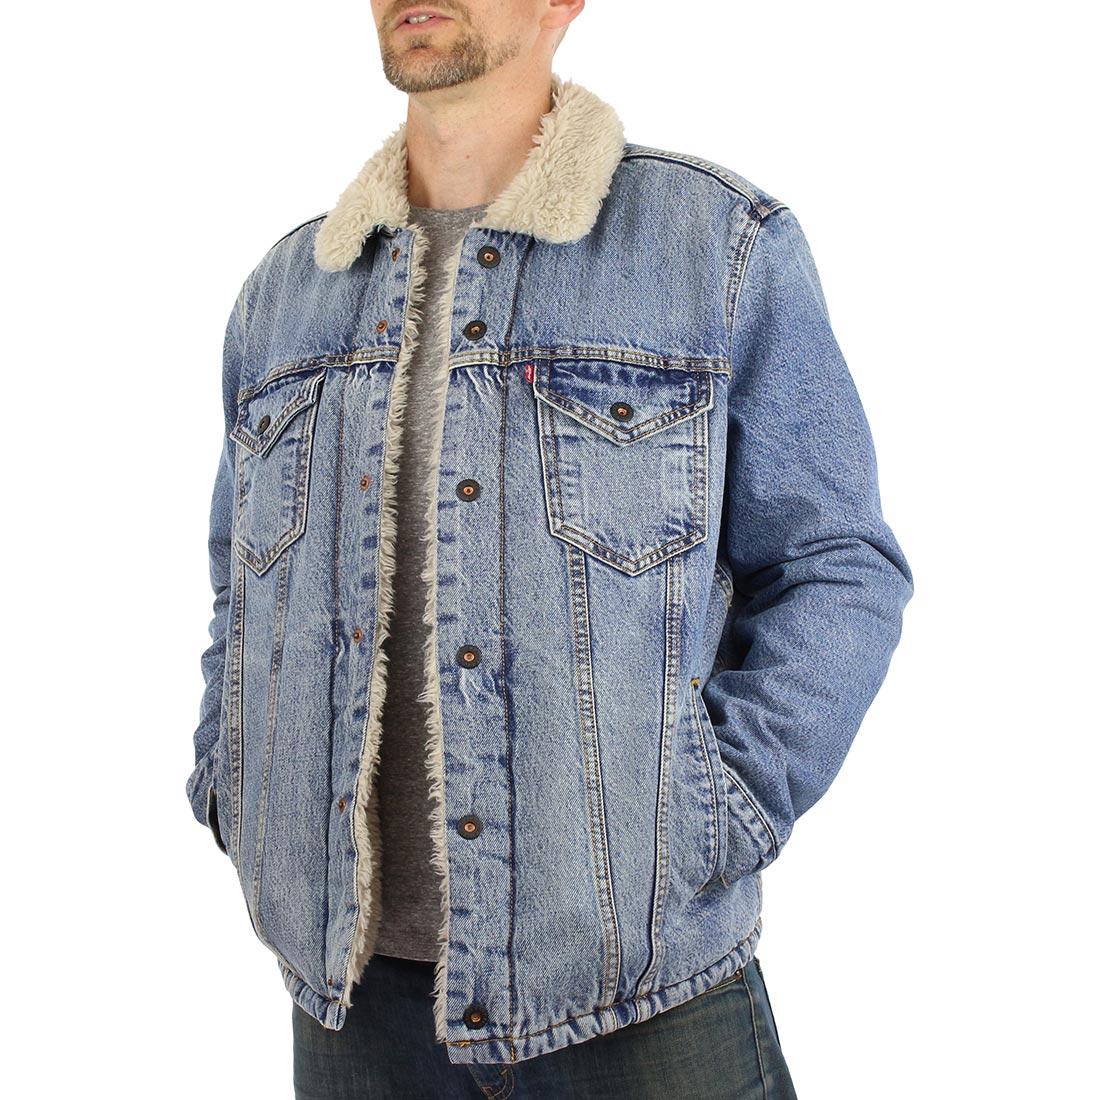 a8c3320576ee Levi's Skate Sherpa Trucker Denim Jacket - Kezar Blue